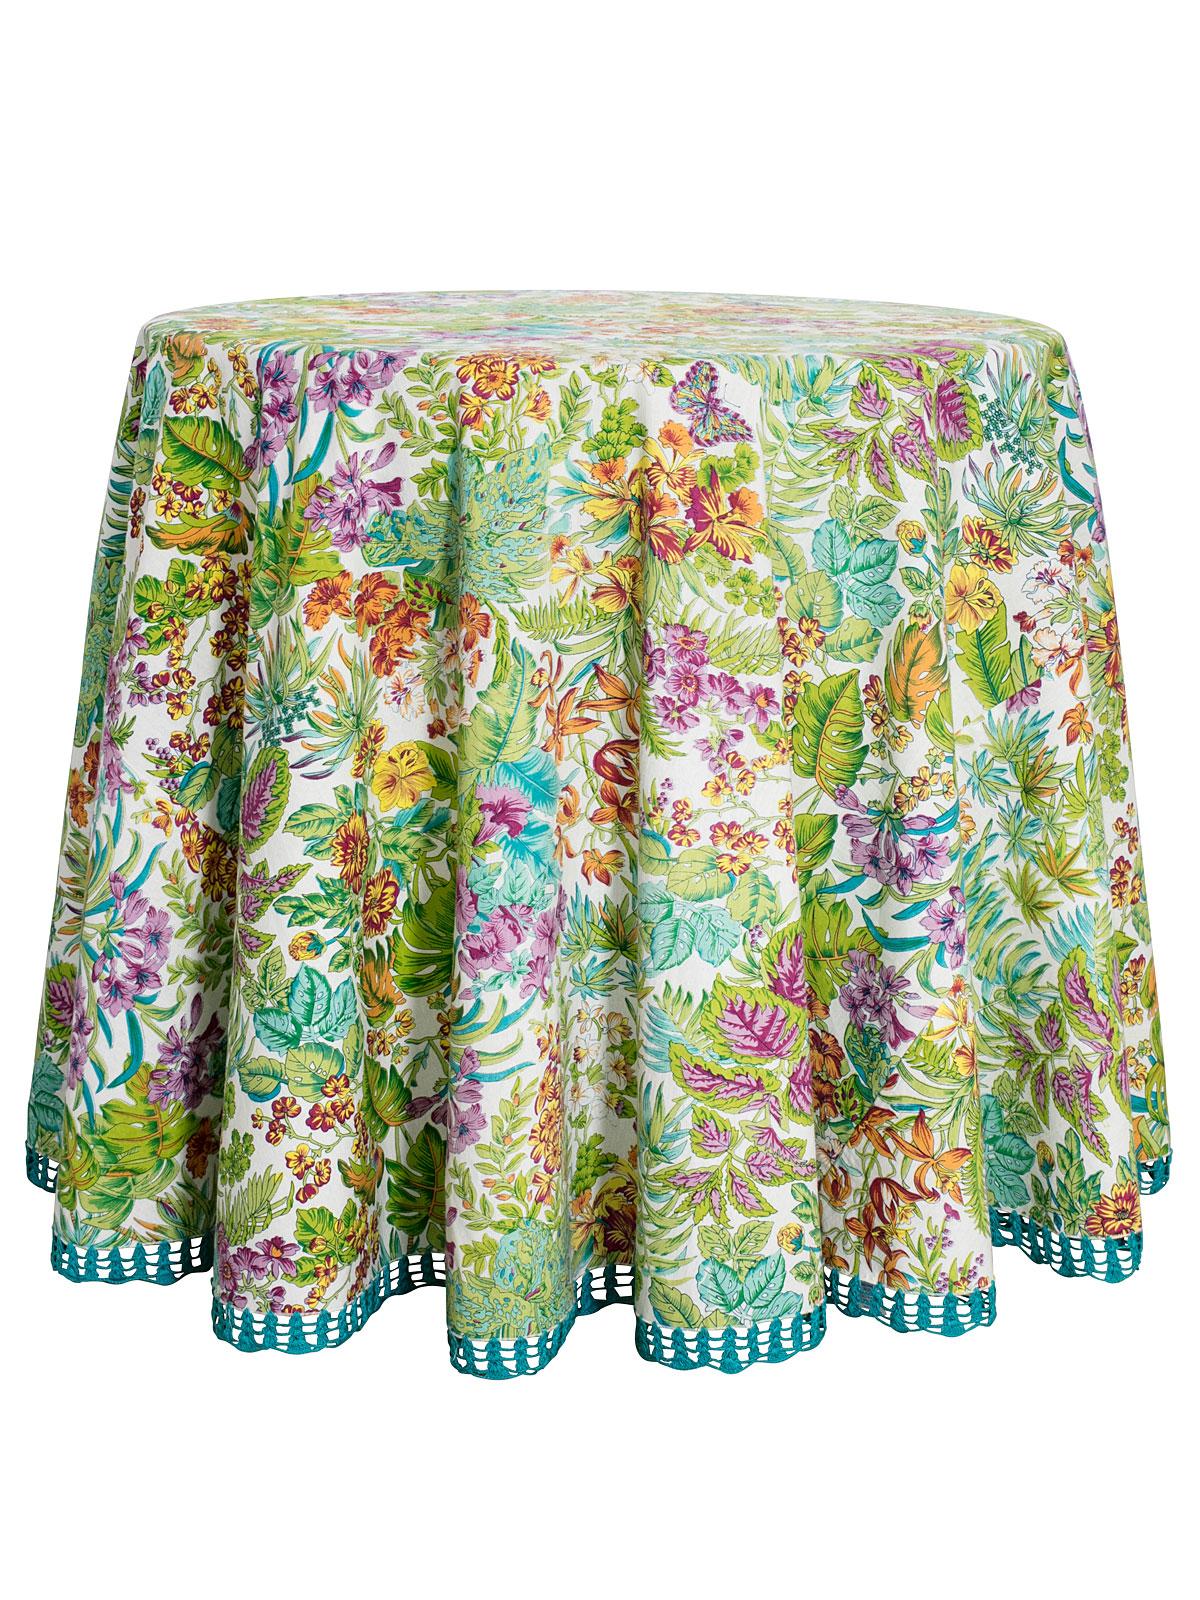 Jungle Round Tablecloth